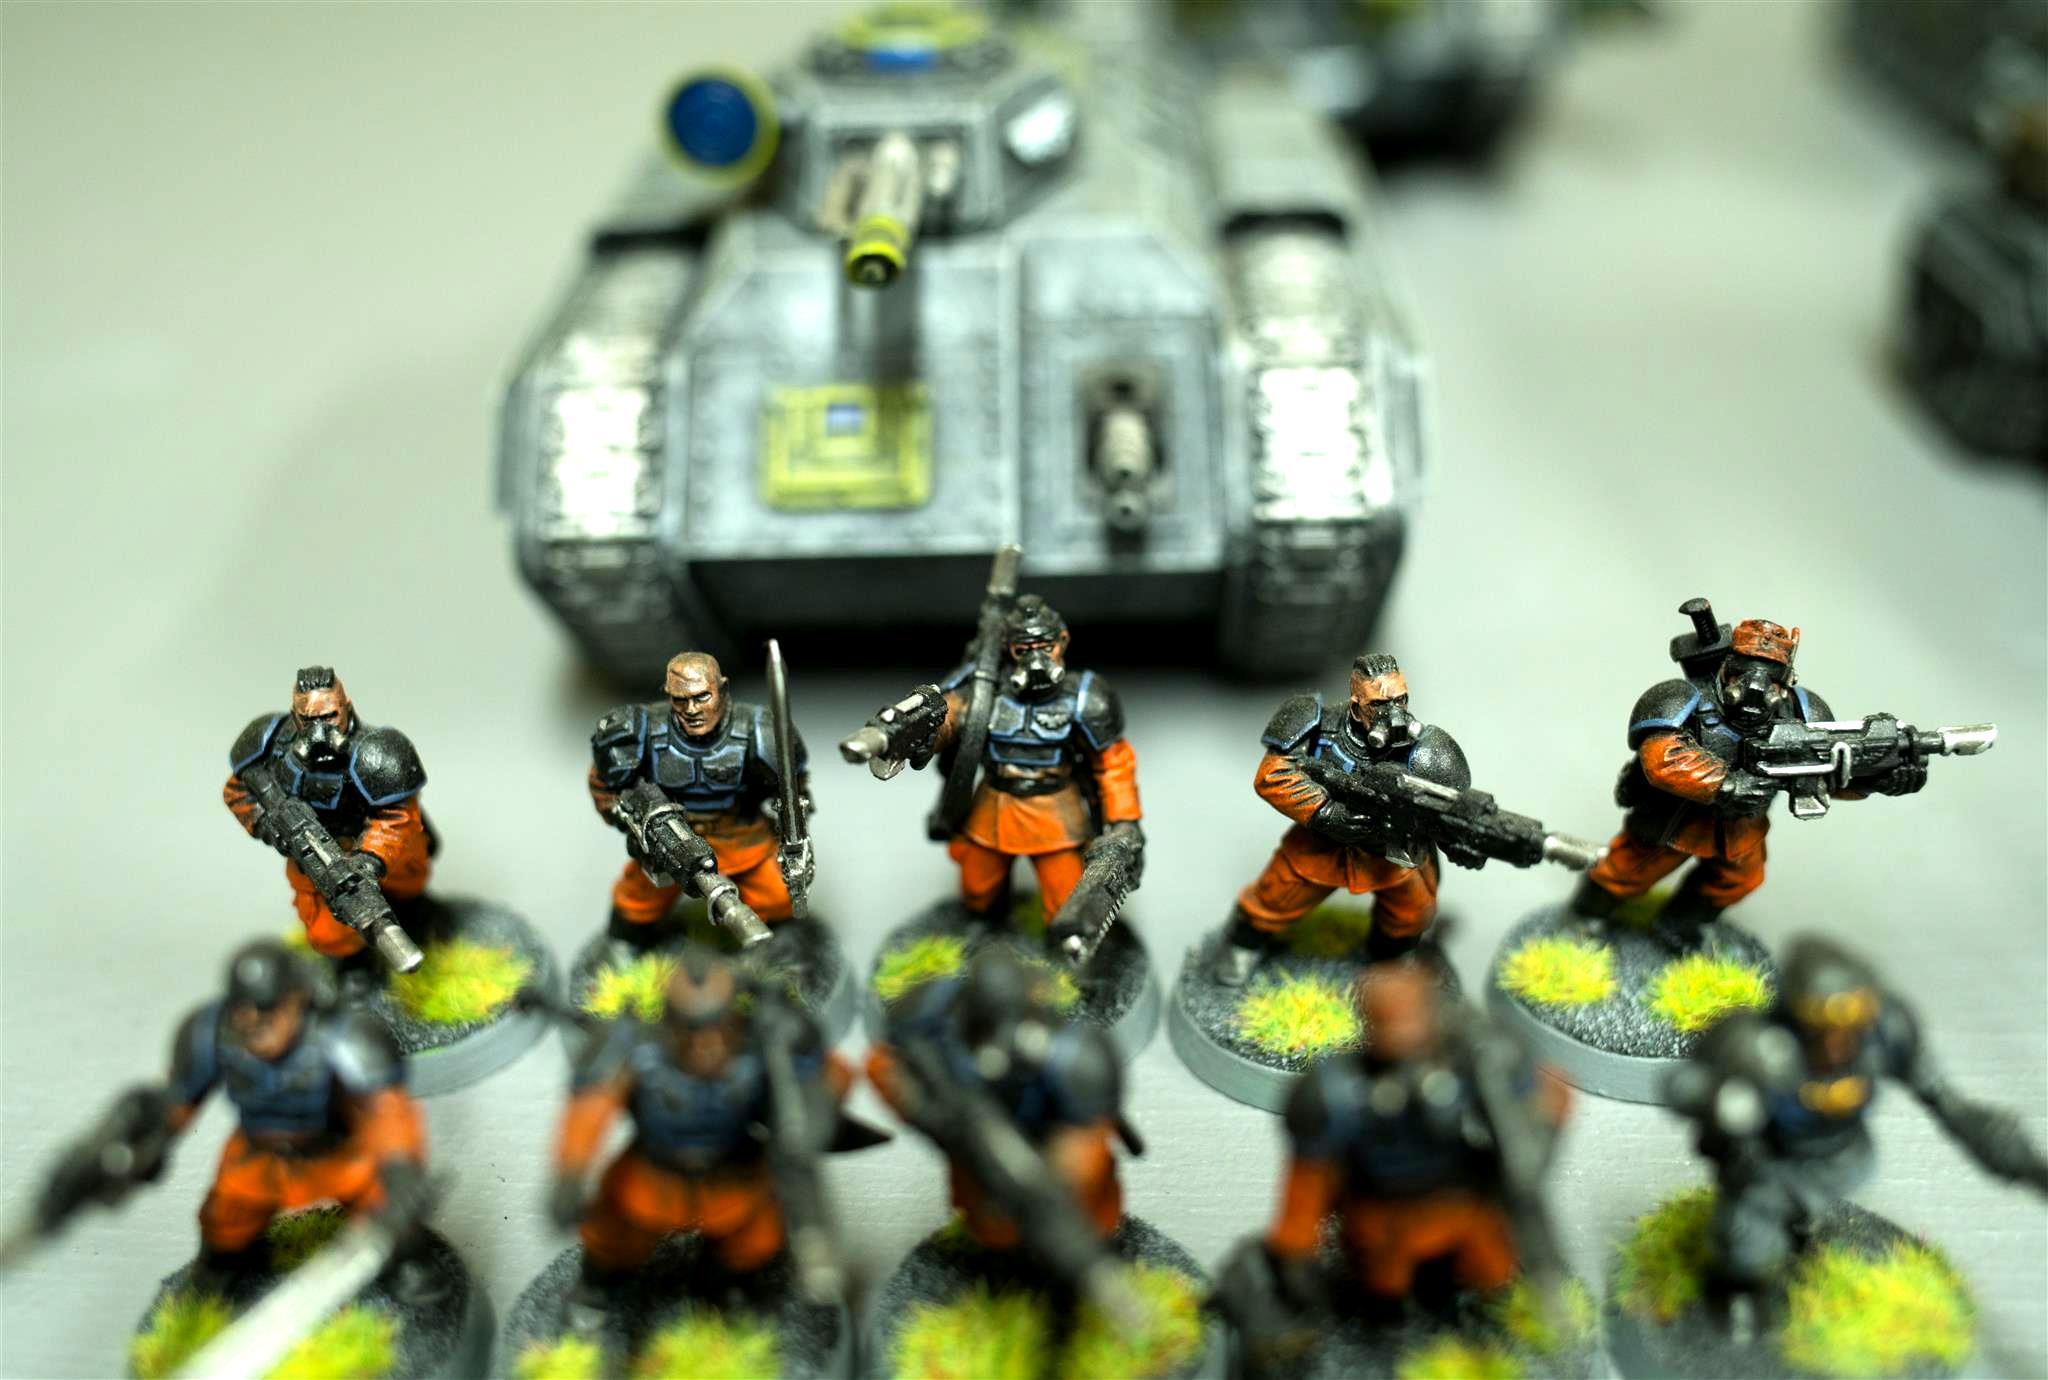 317th Sathanas Hoplites, Astra Militarum, Guard, Imp Guard, Imperial Guard, Penal Legion, Penal Legion Squad, Penal Legionaires, Veteran, Veteran Penal Legionaires